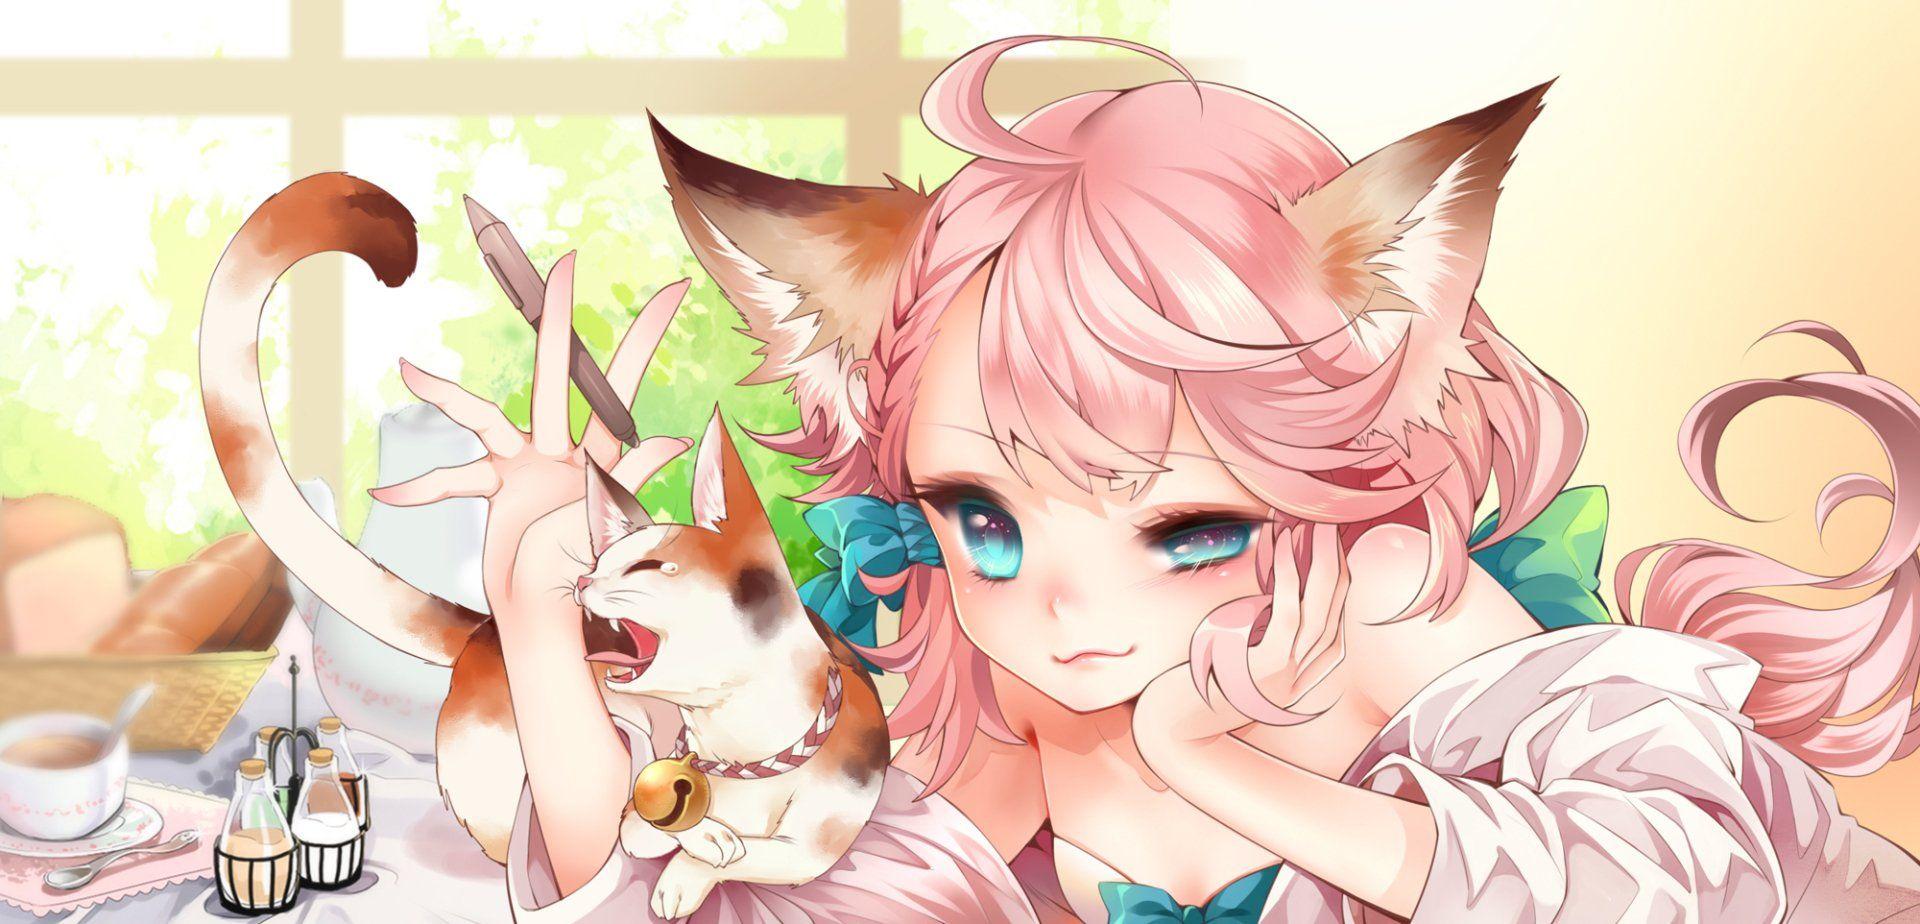 Anime Original Girl Long Hair Pink Hair Blue Eyes Smile Animal Ears Cat Girl Cat Animal Drink Tea Cup Pen Wallpaper Anime Animal Ears Cat Girl